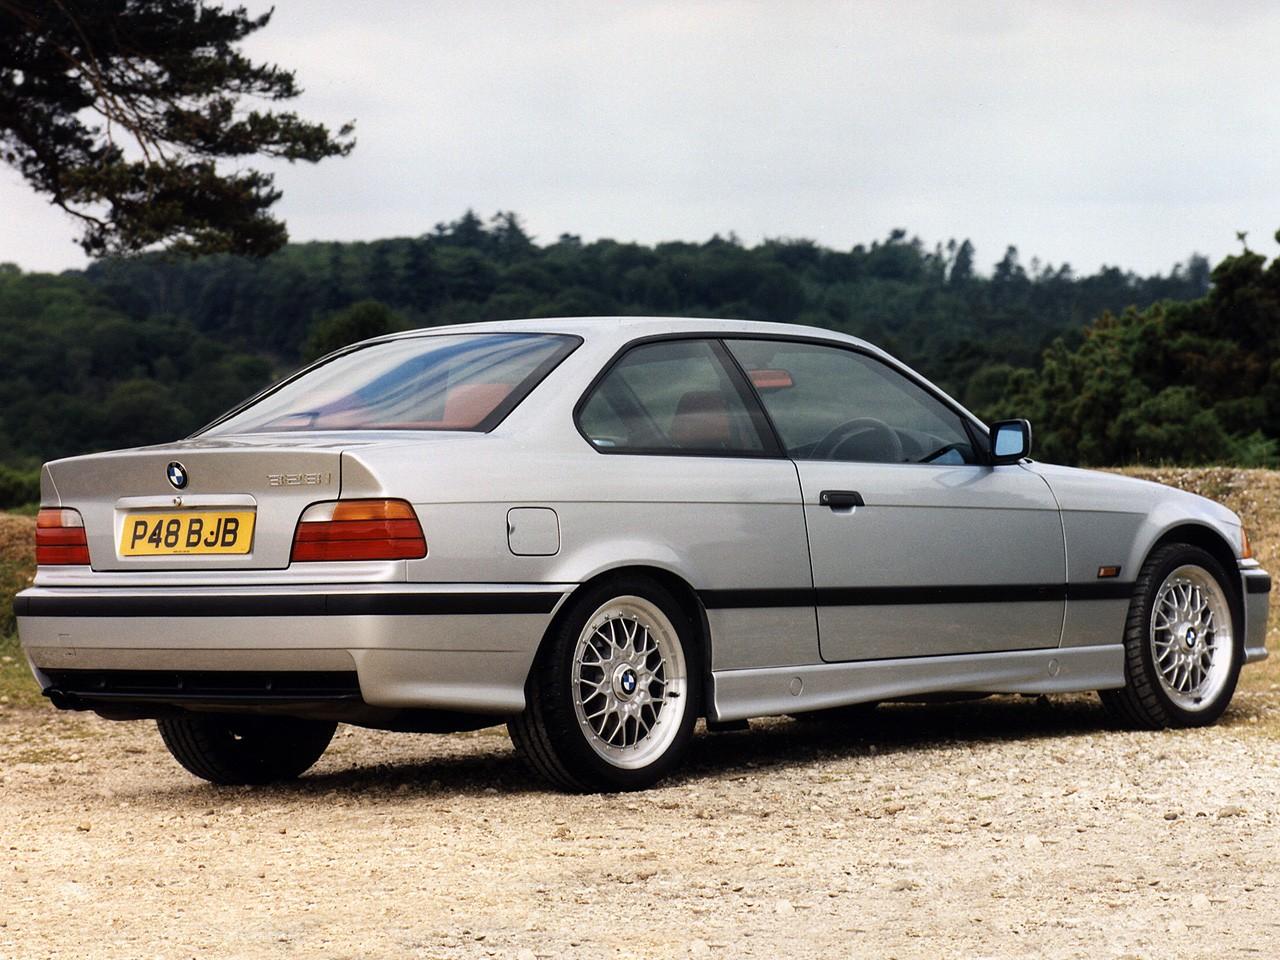 Bmw 3 series coupe e36 specs 1992 1993 1994 1995 1996 1997 1998 autoevolution